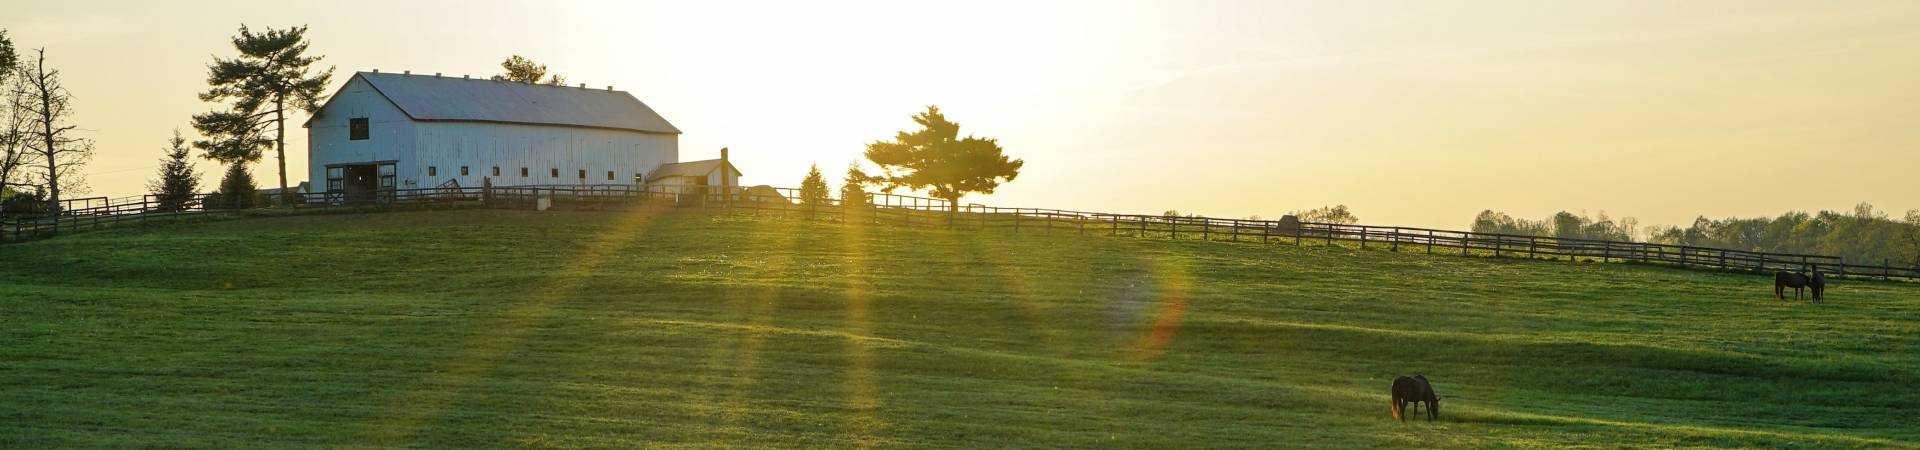 White-house-beside-grass-field-2042161